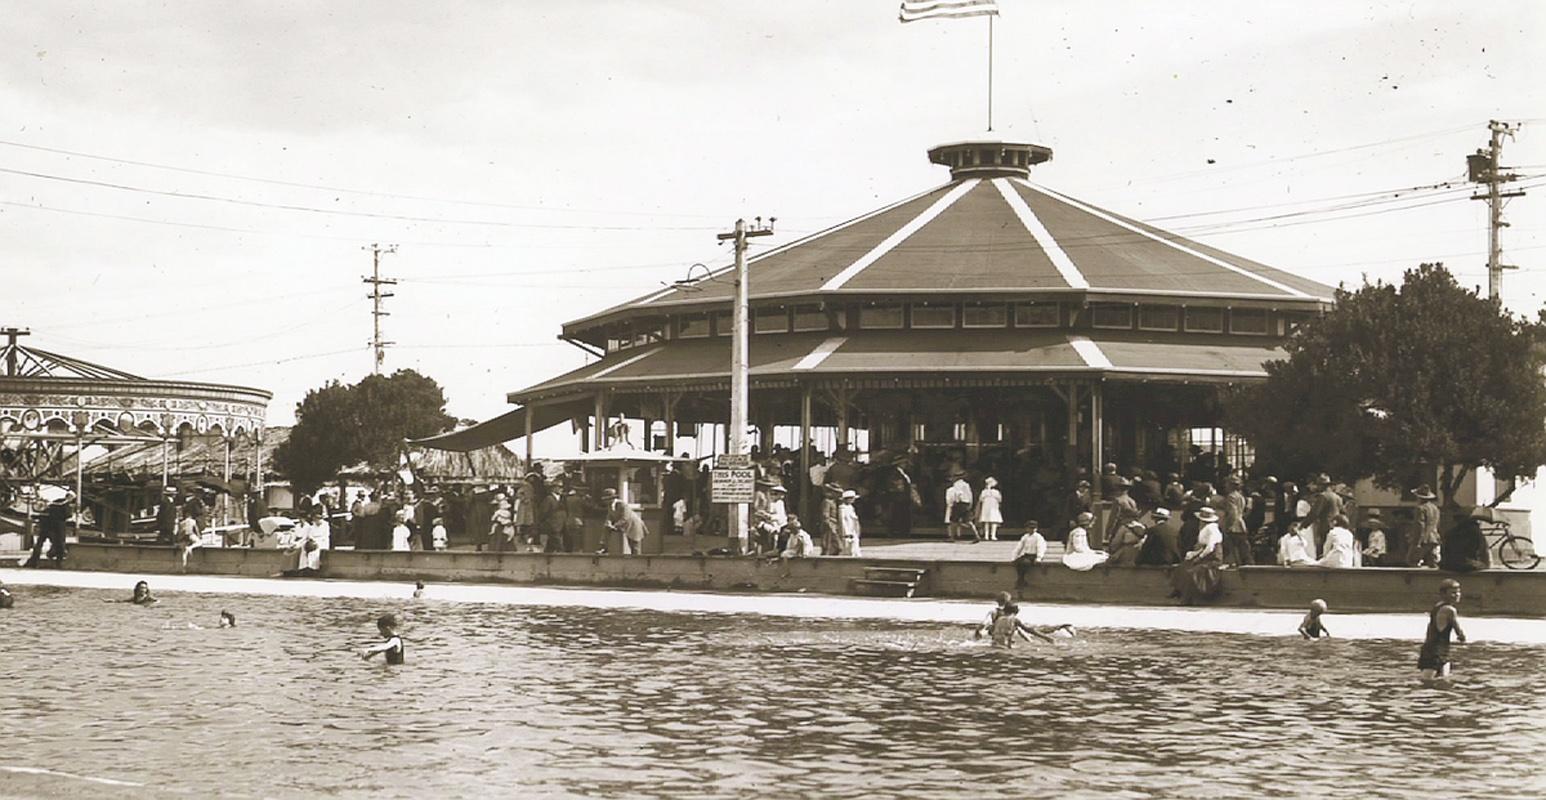 Balboa-Park-Historic-Carousel-Tent-City-Coronado-CA-1915